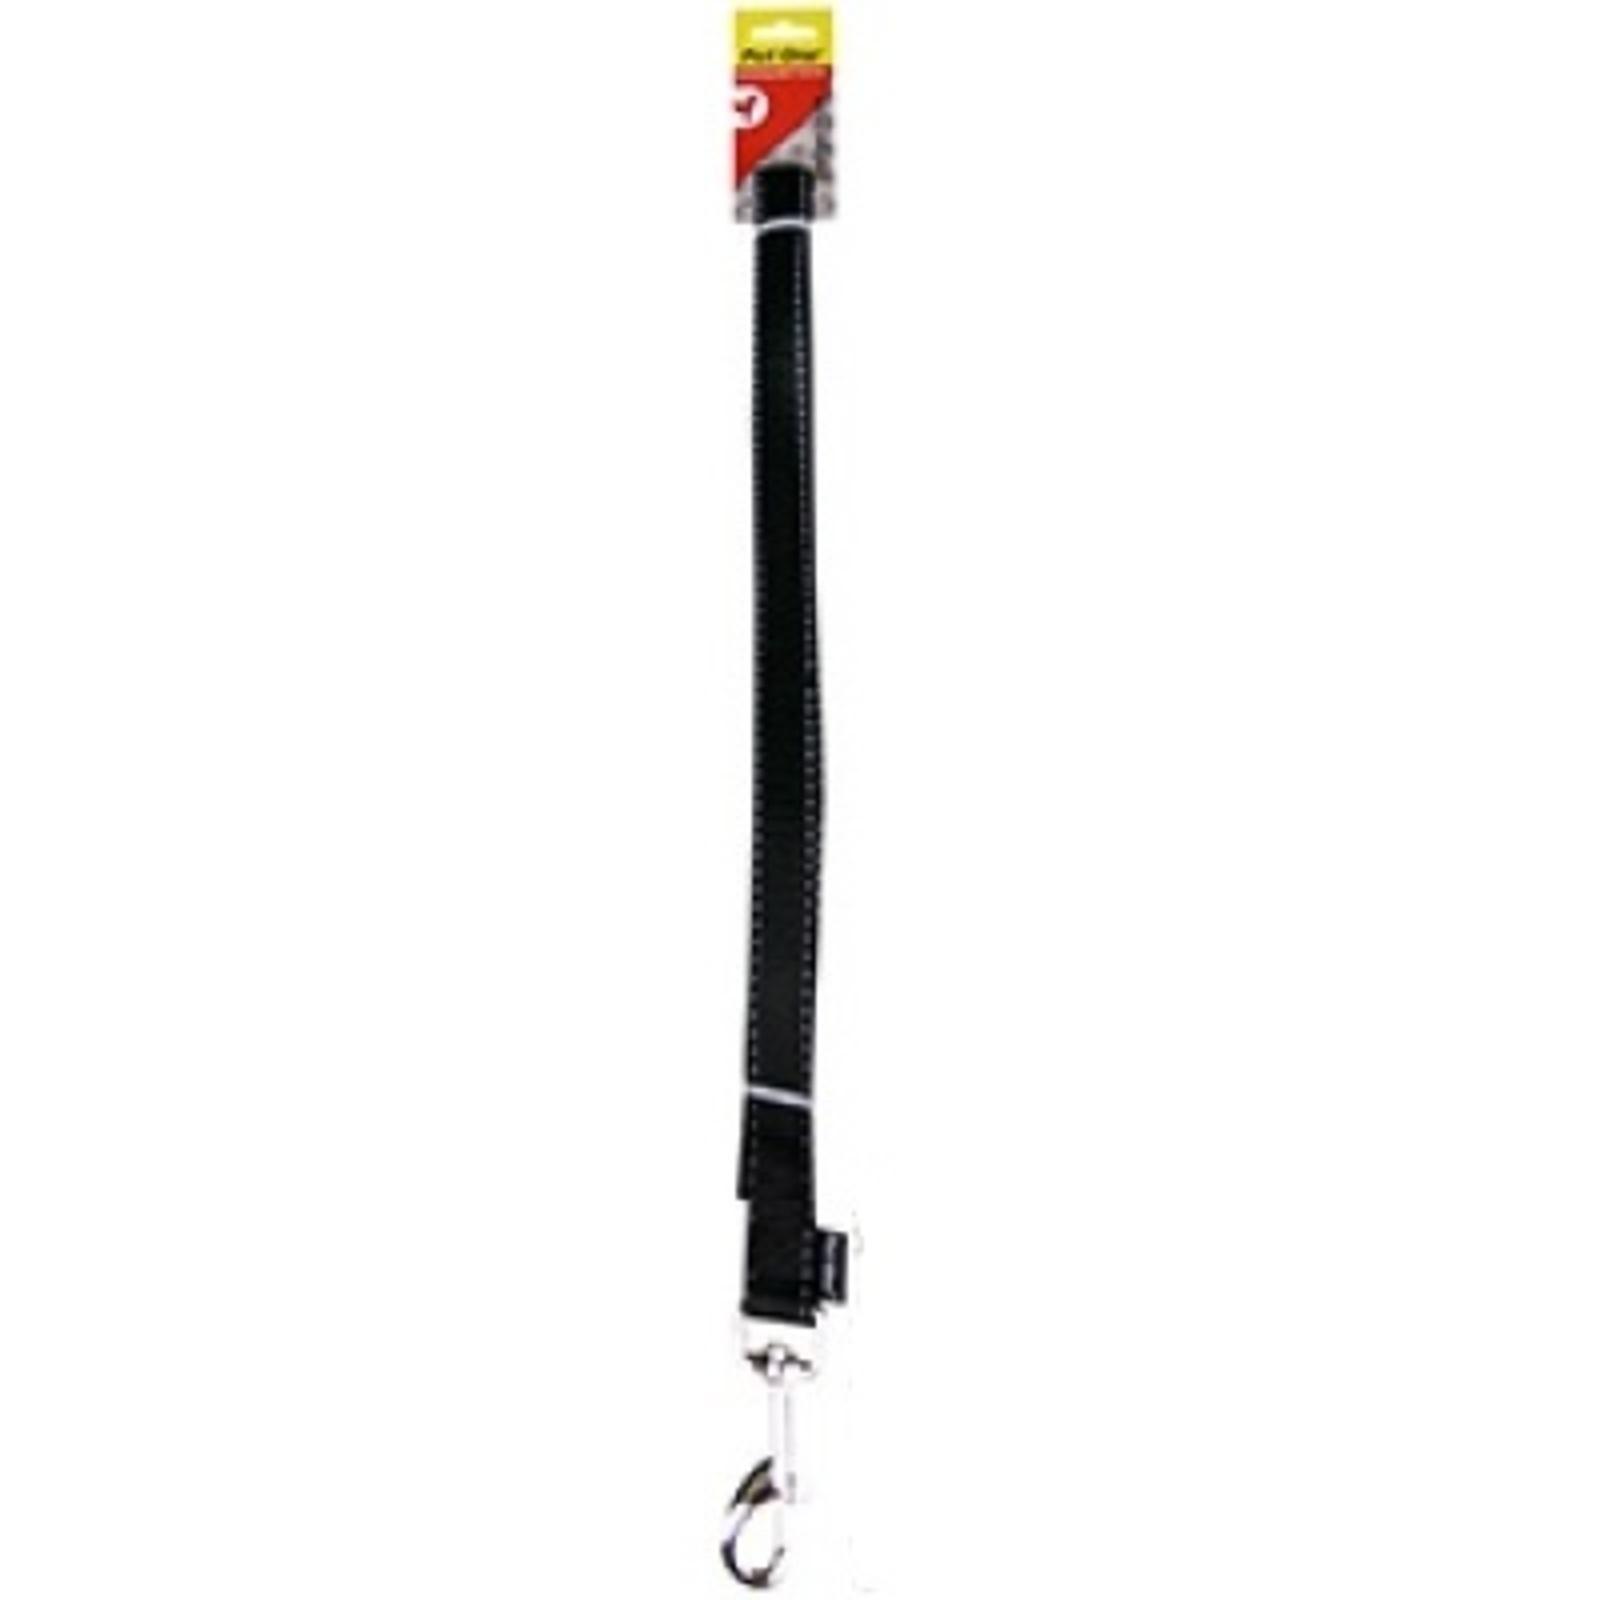 Dog Leash Lead Reflective Nylon - Black - 25mm x 120cm (Pet One)